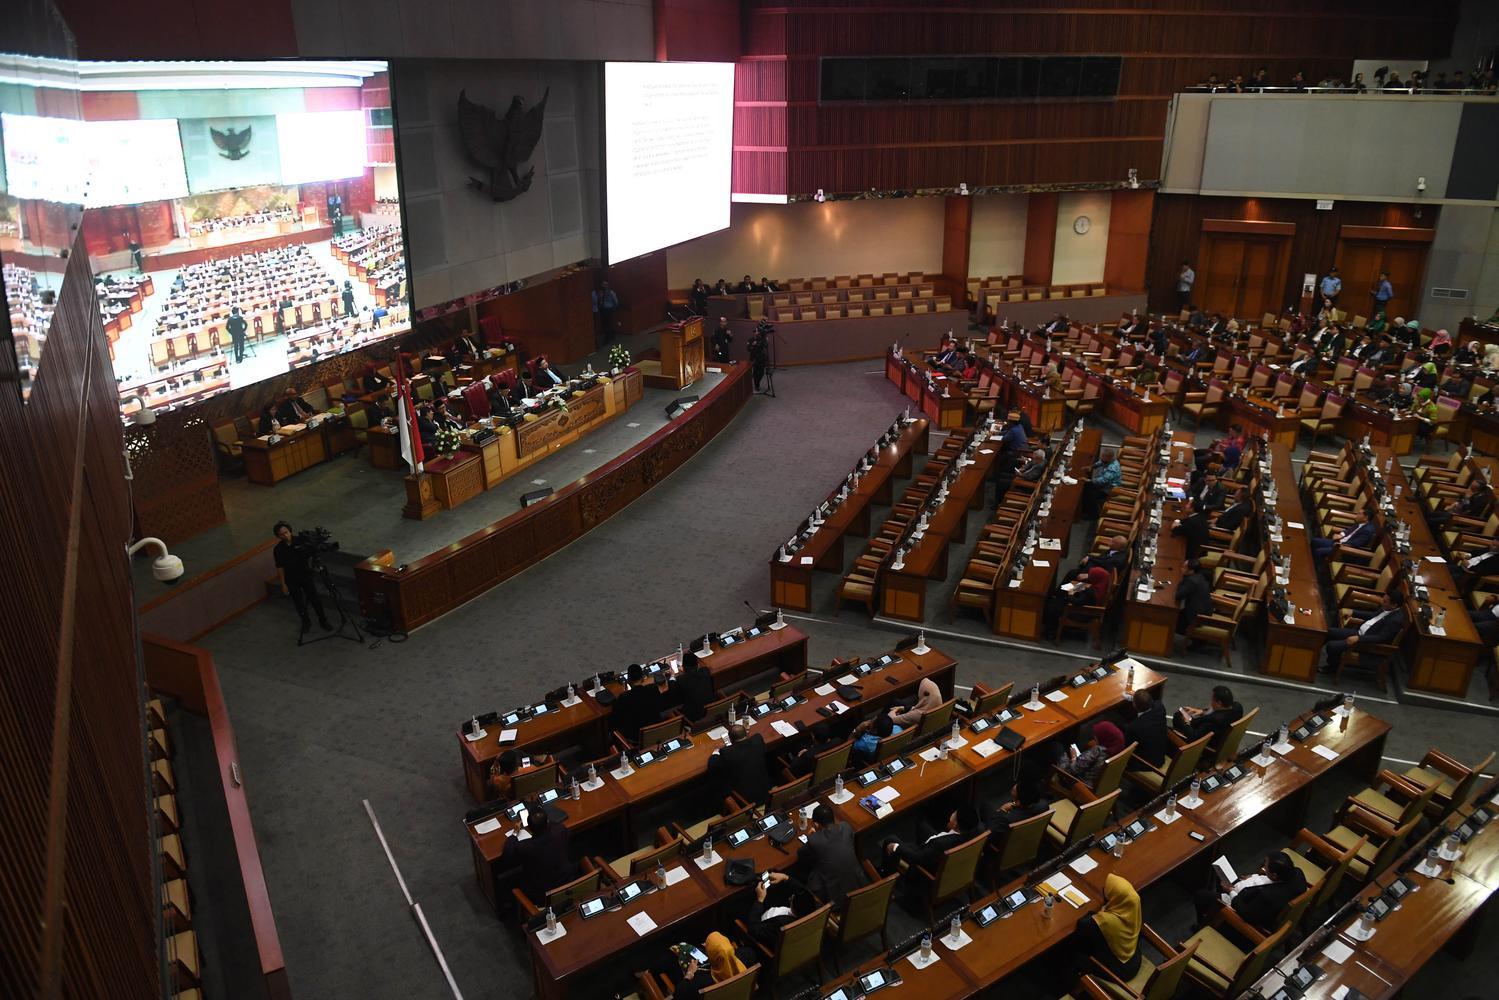 SIDANG PARIPURNA TERAKHIR DPR 2014-2019